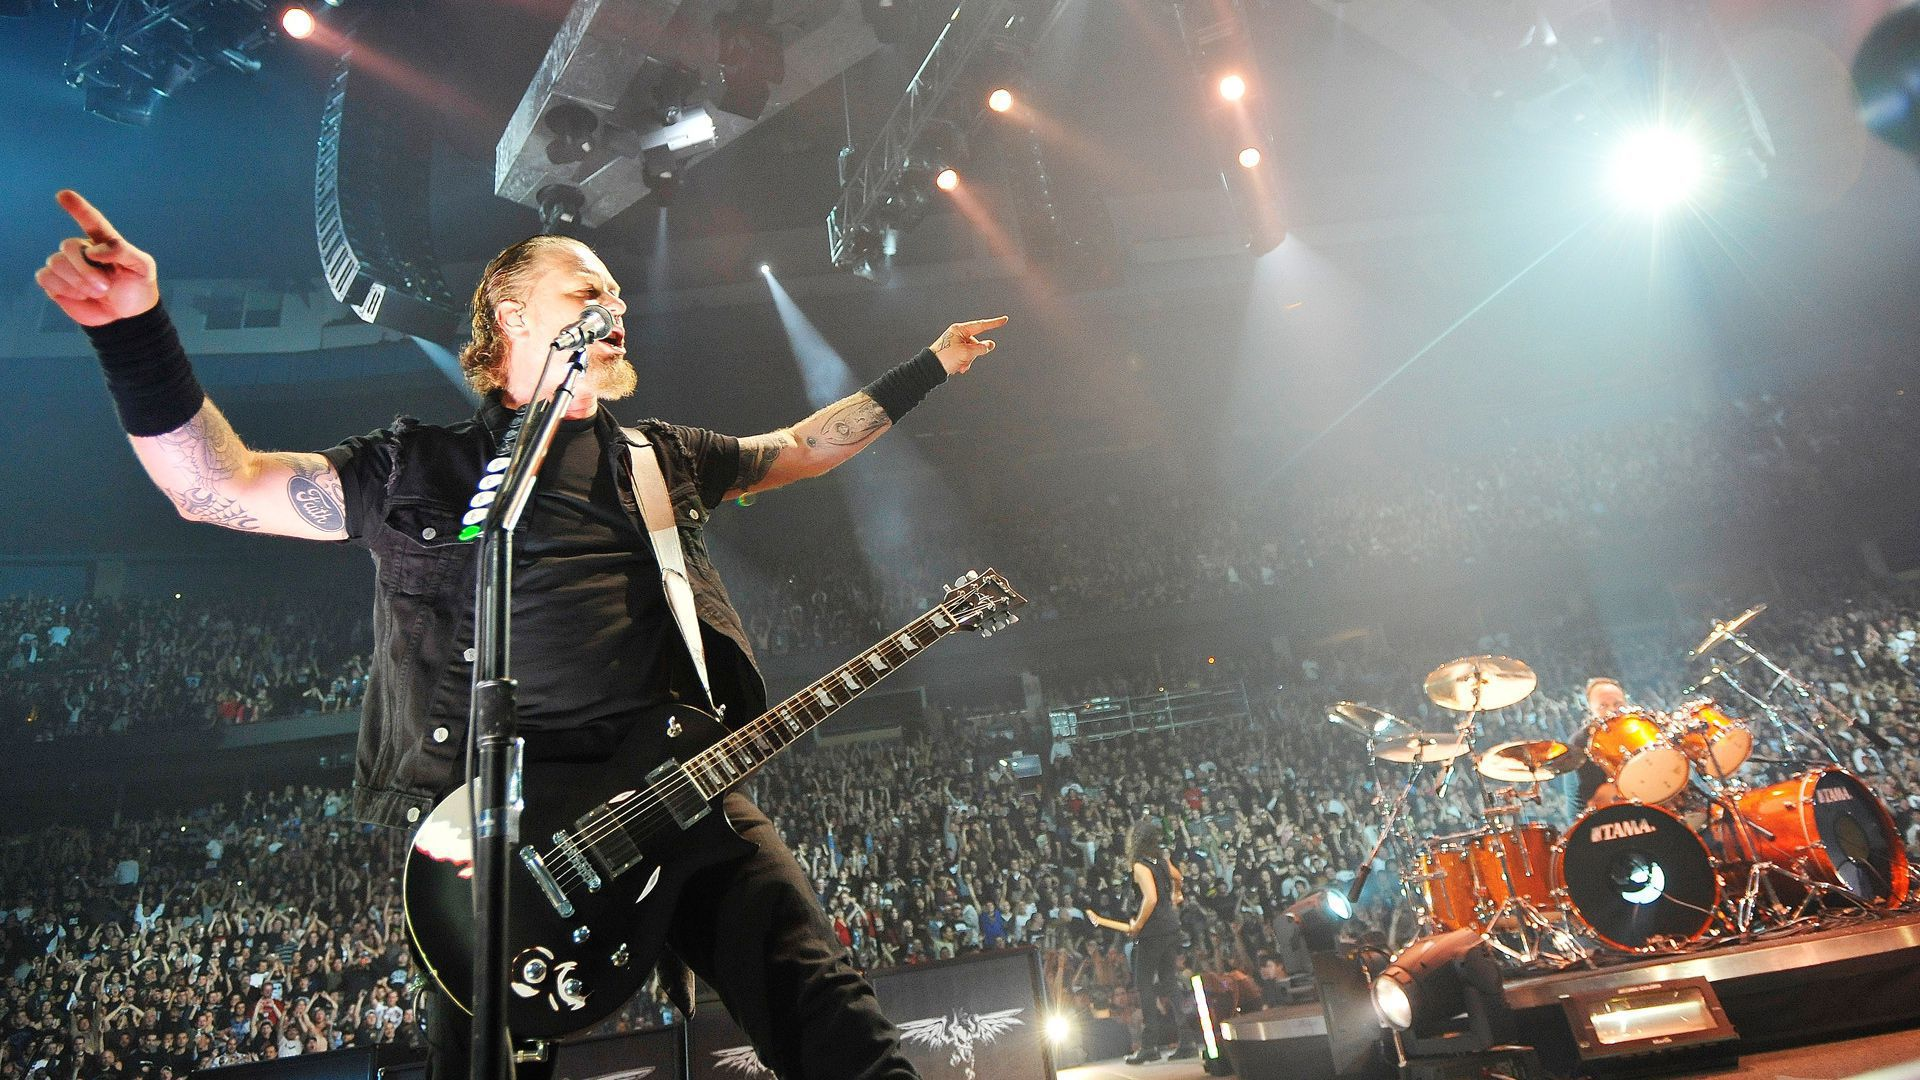 Metallica Wallpaper Hd 1080p Metallica Wallpaper Fo...